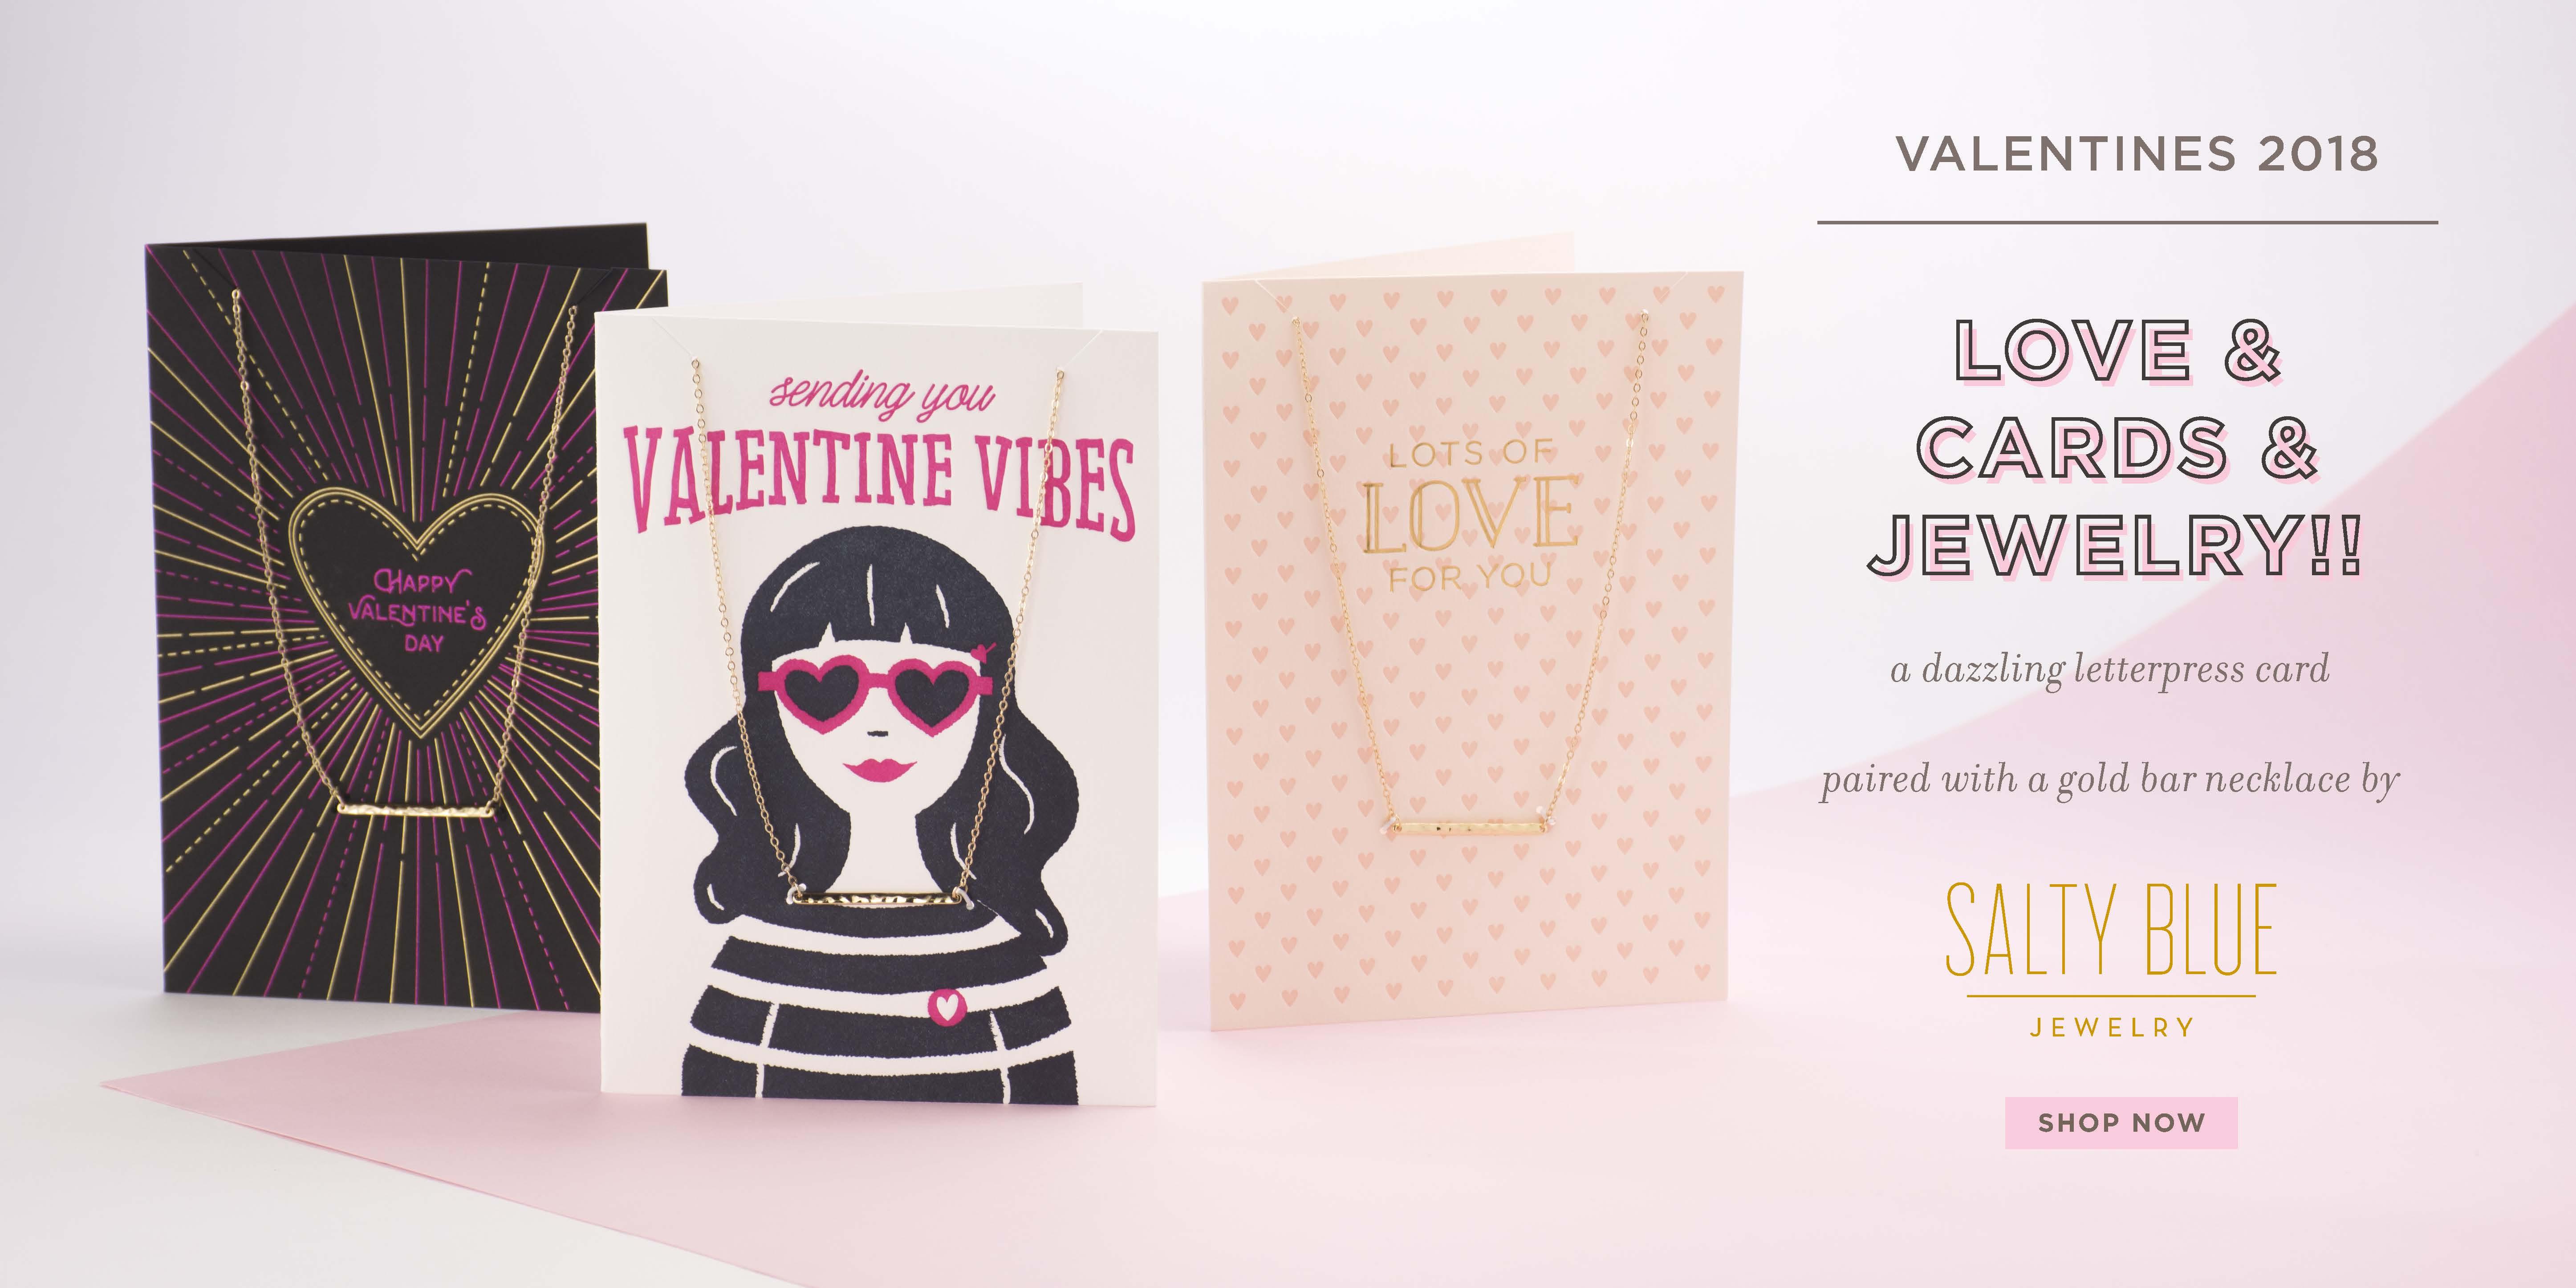 Valentine's letterpress card w/necklace